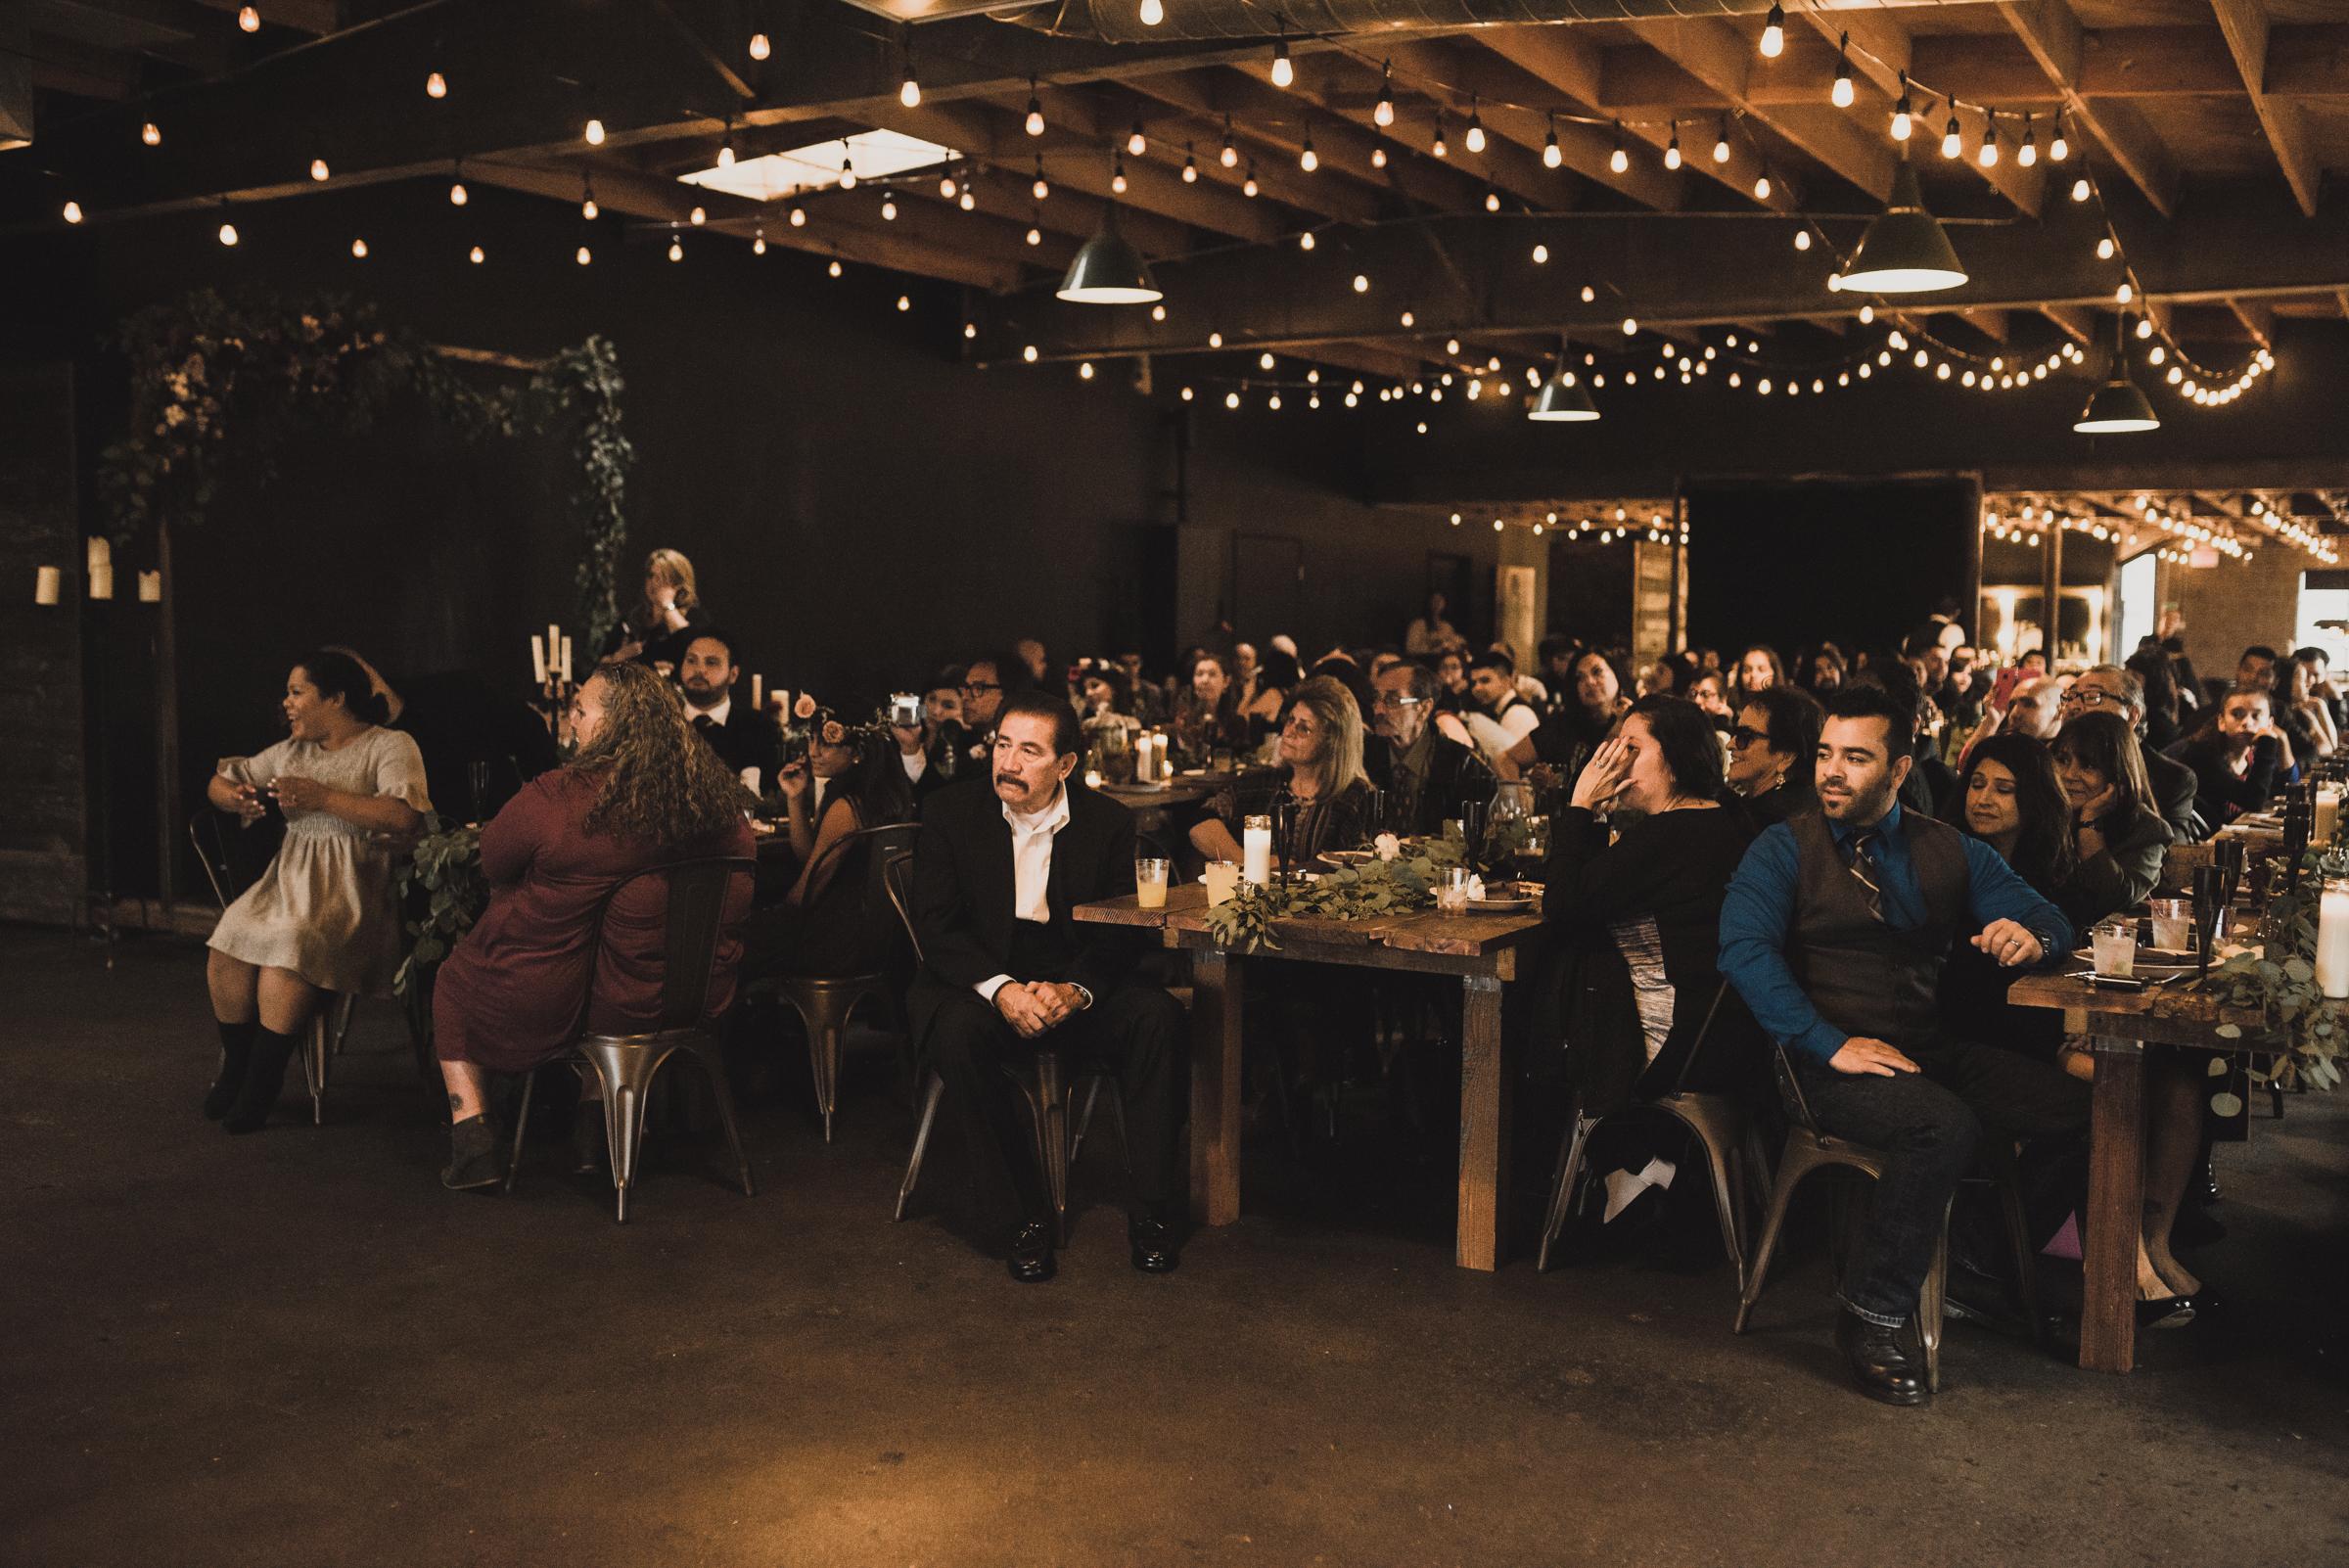 ©Isaiah + Taylor Photography - Smoky Hollow Studios Wedding, El Segundo, Los Angeles Wedding Photographer-124.jpg